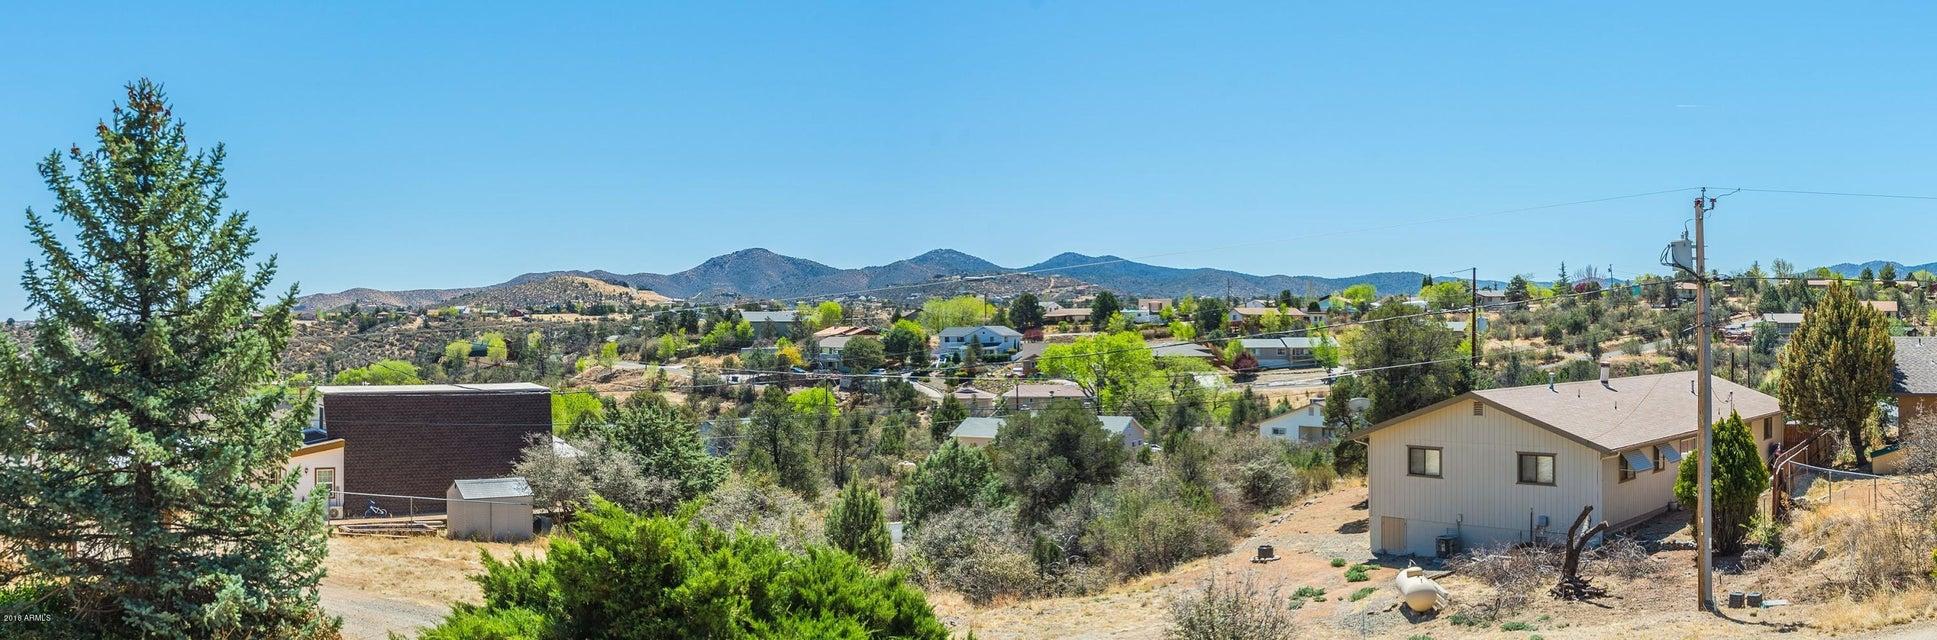 MLS 5754766 4615 E WILLIAM Drive, Prescott, AZ Prescott AZ Affordable